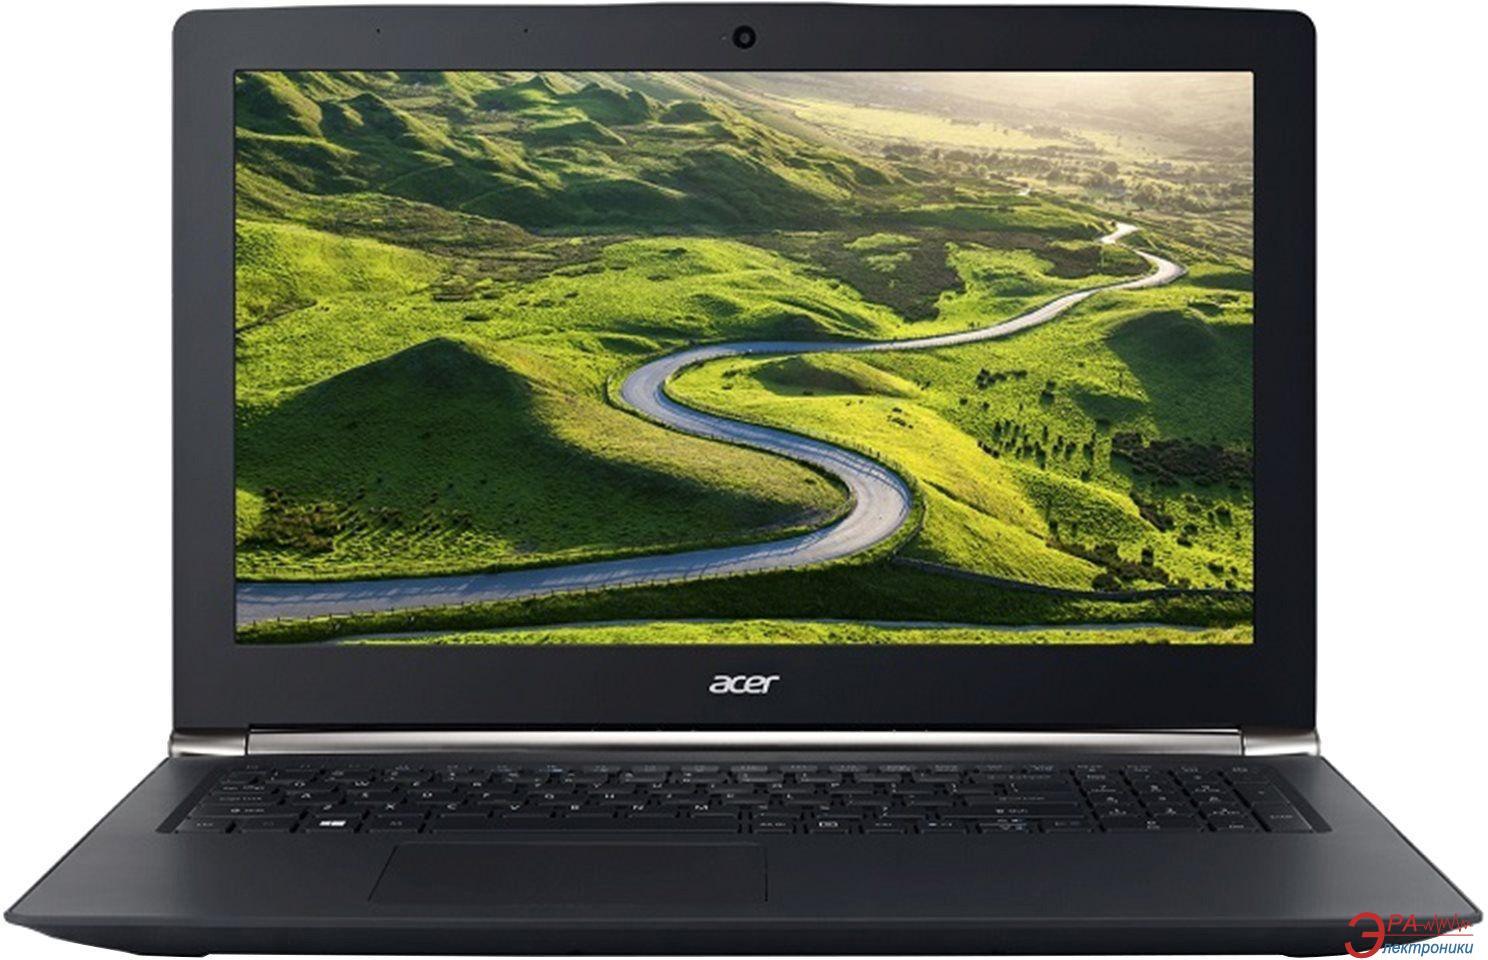 Ноутбук Acer Aspire Nitro VN7-592G-58BK (NX.G6JEU.006) Black 15,6